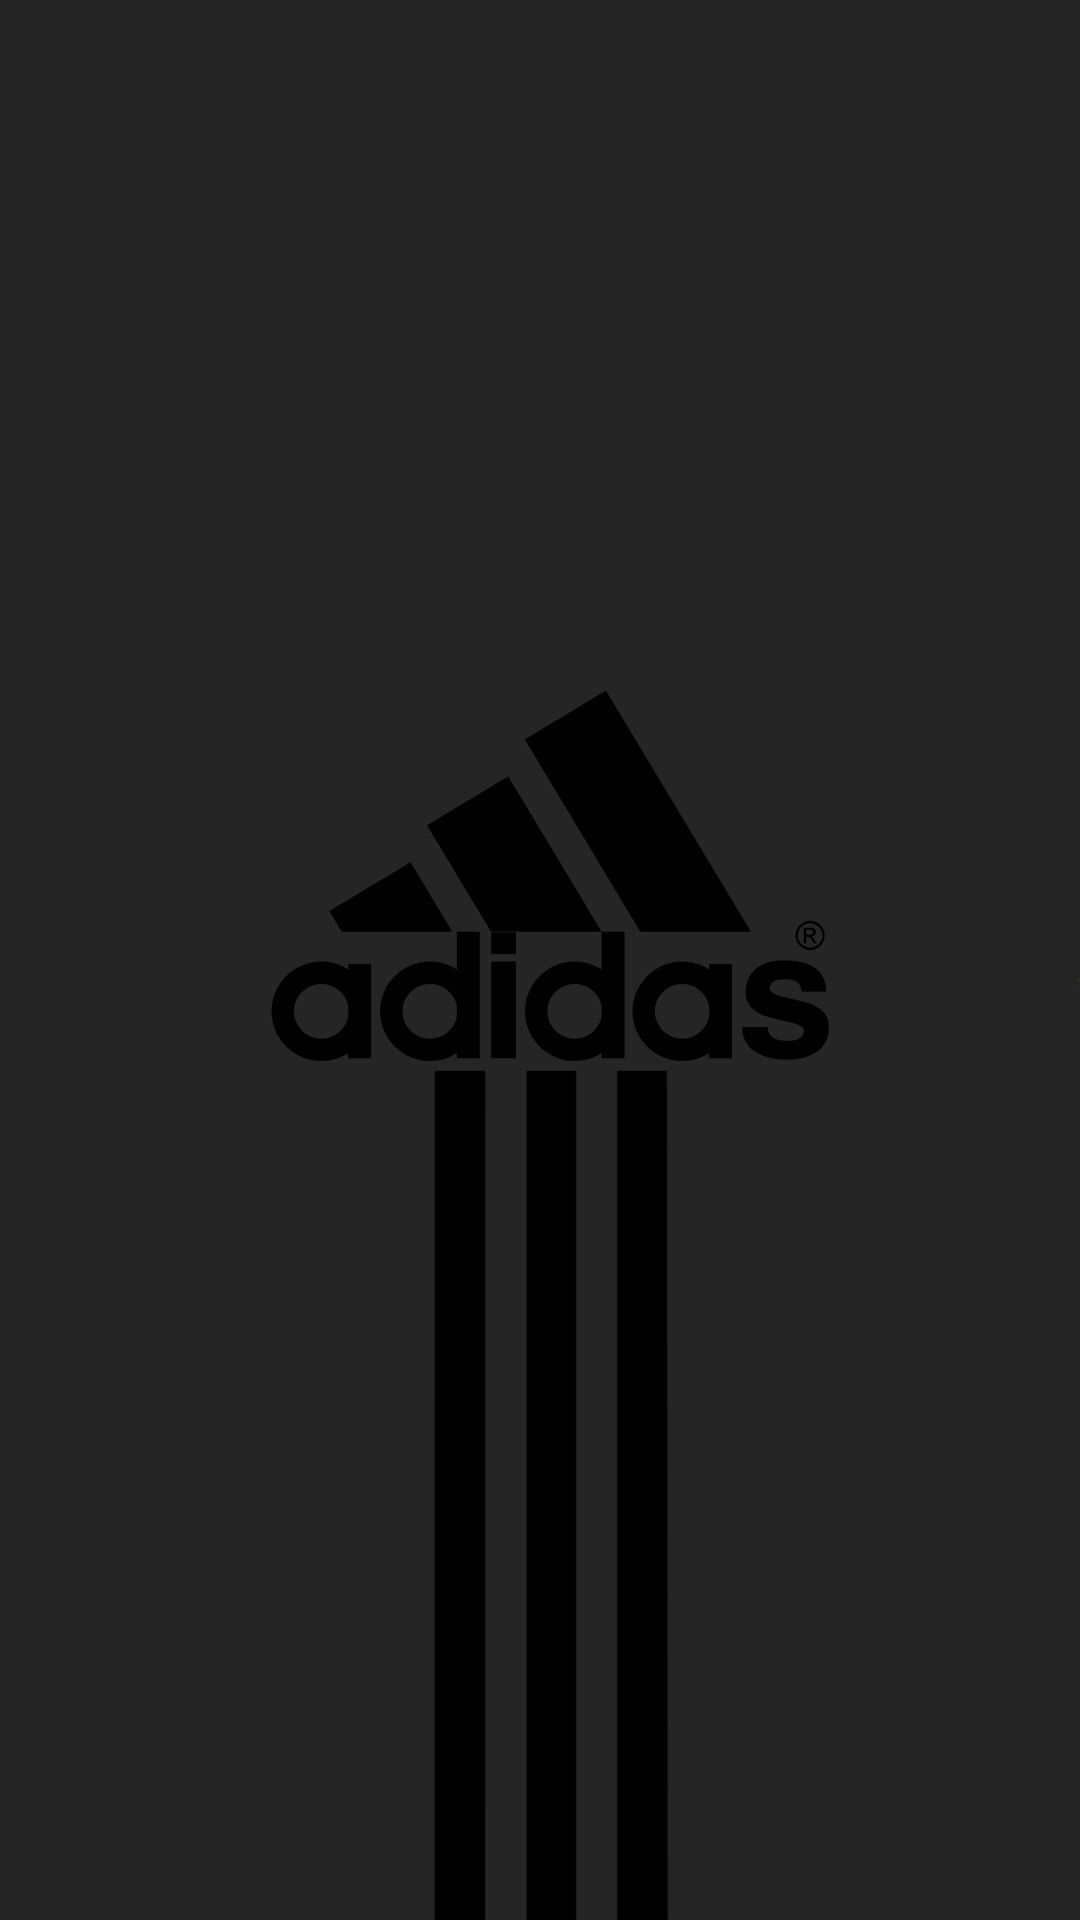 Adidas Adidas Logo Wallpapers Adidas Wallpapers Adidas Iphone Wallpaper